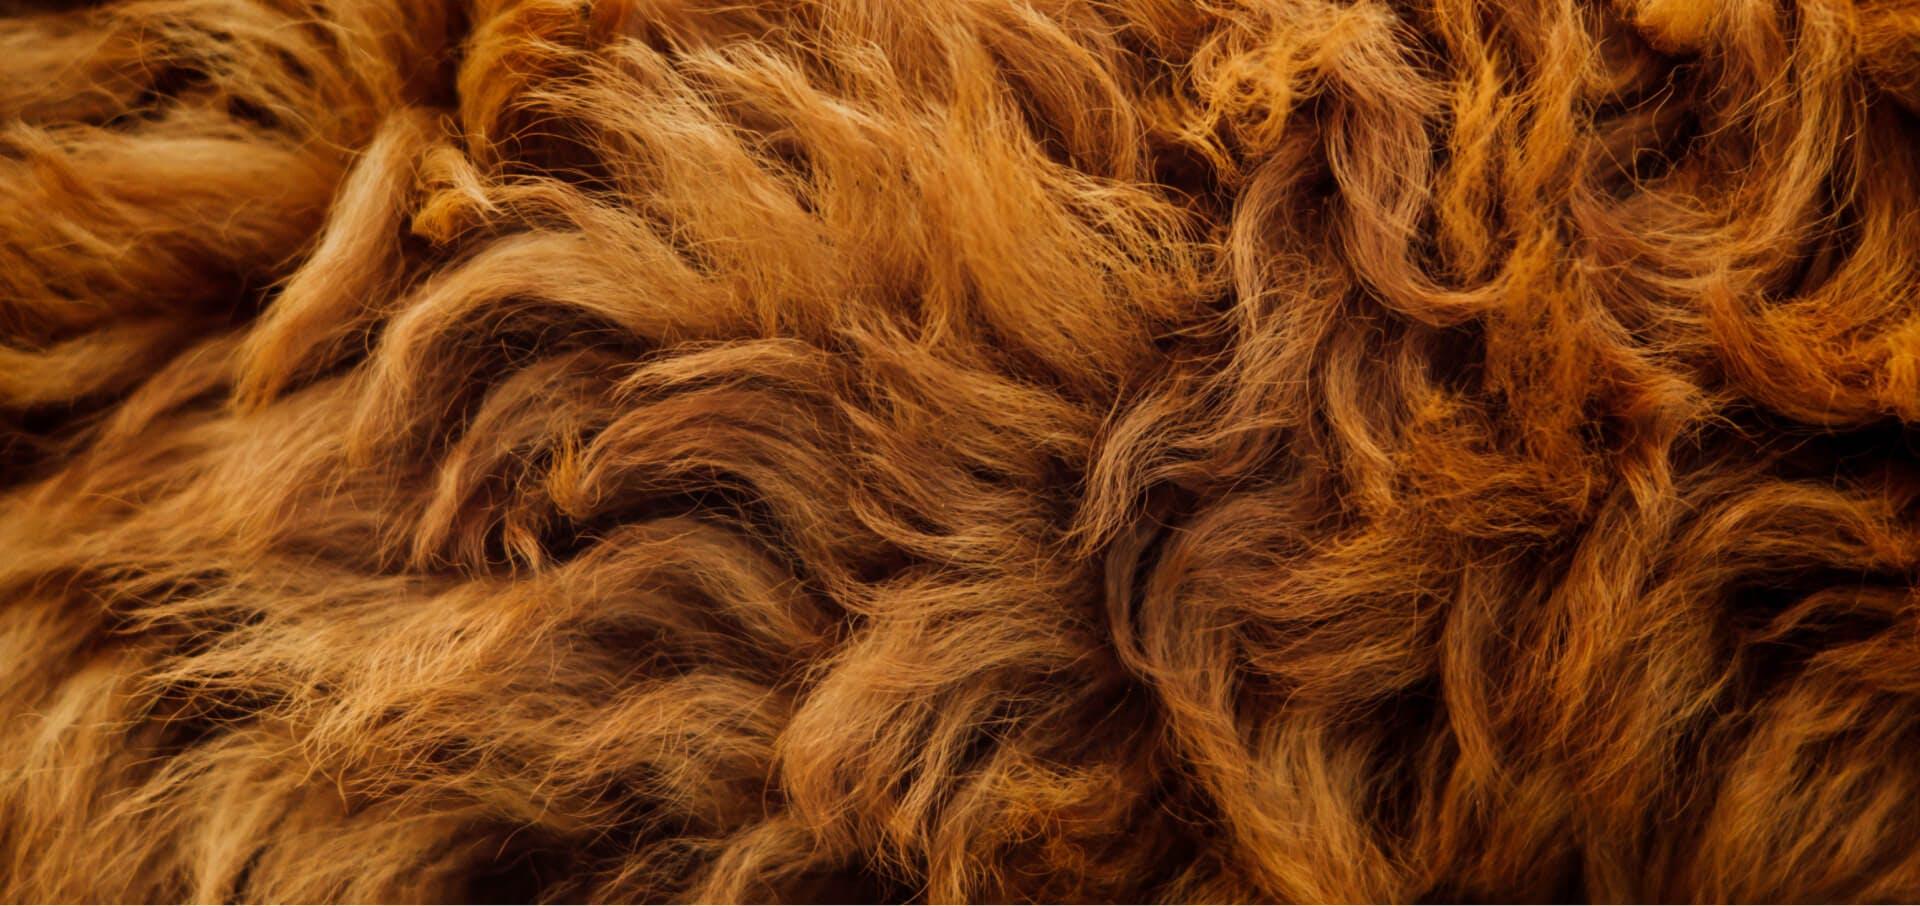 Dog hair focusing